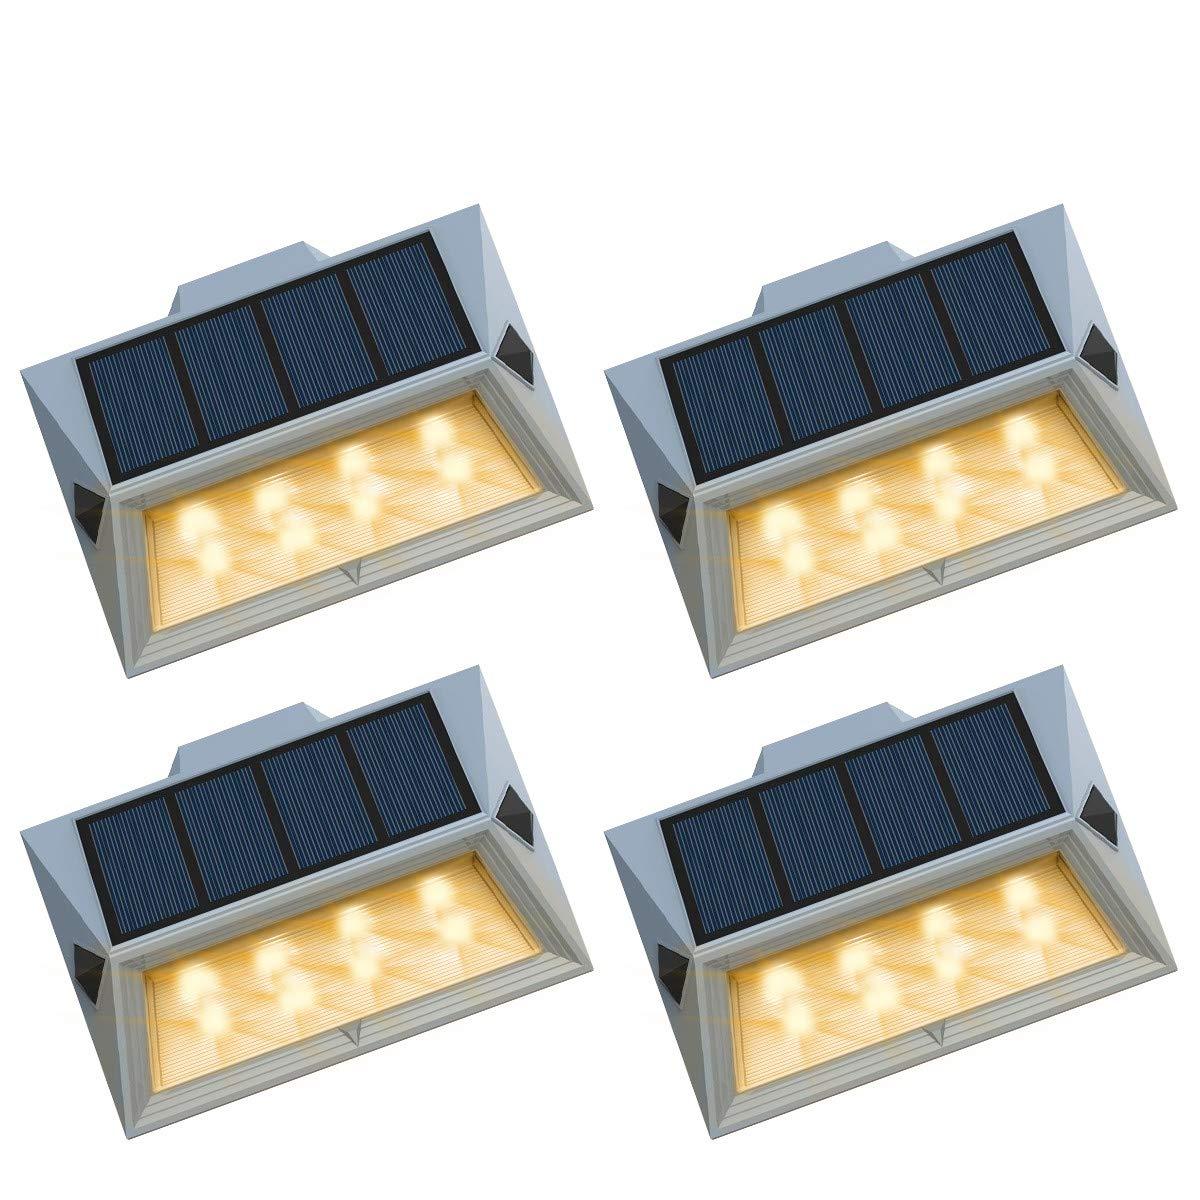 Roopure Warm White Solar Deck Light